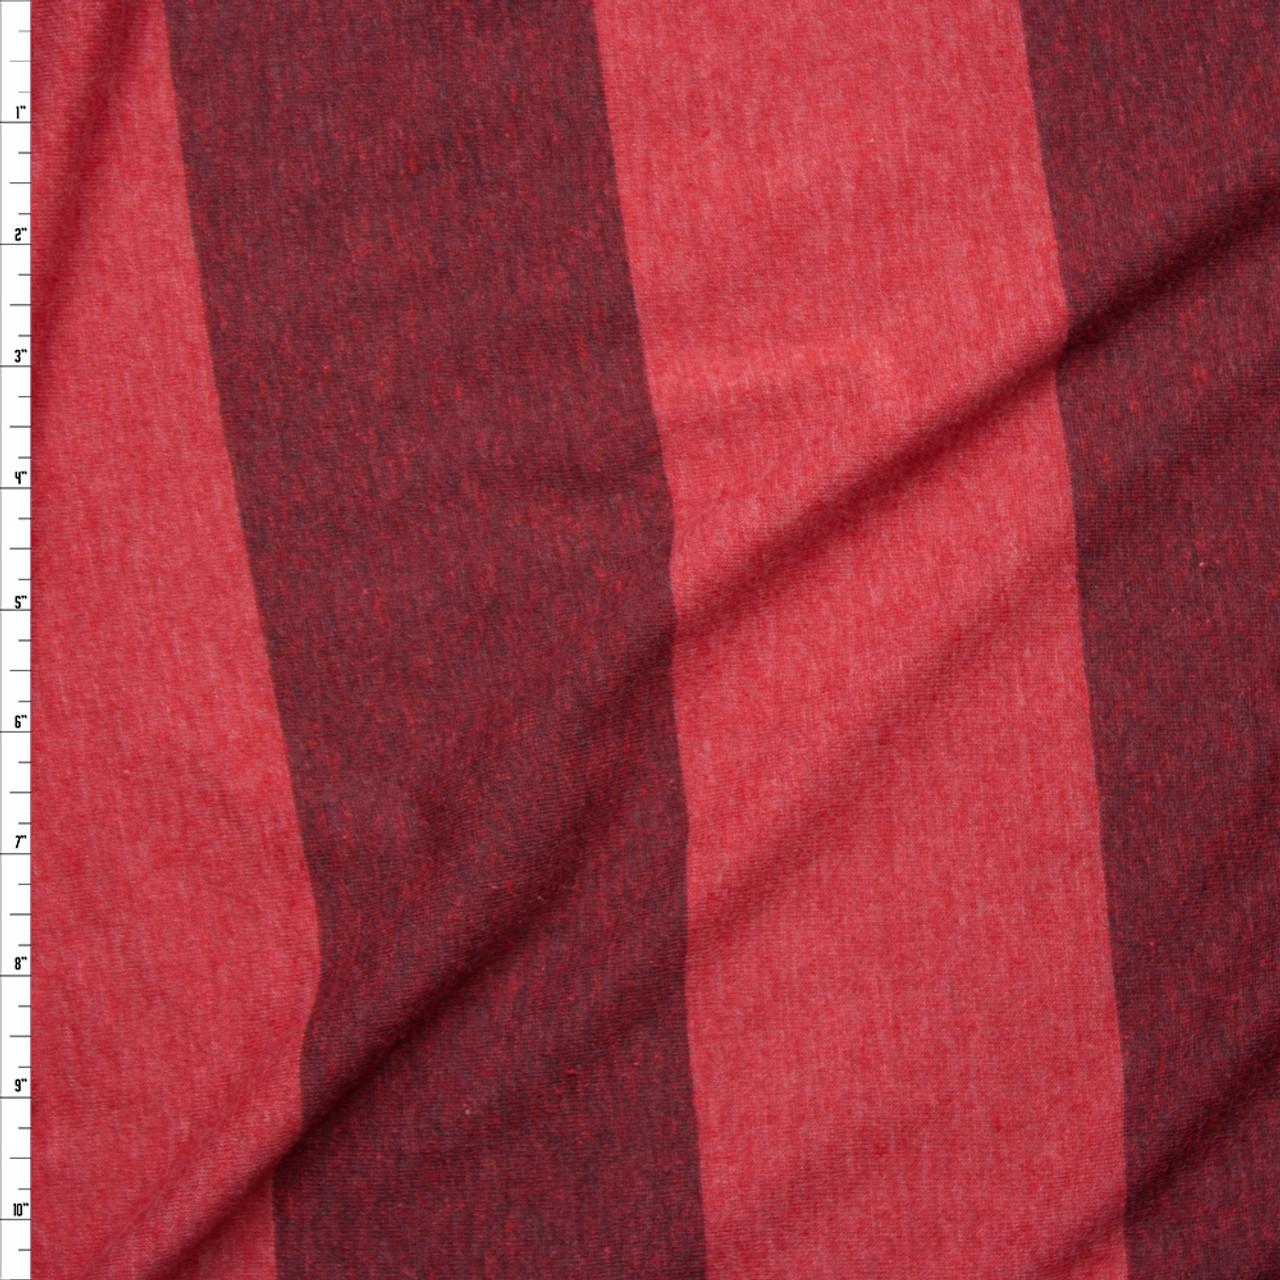 869c8c929be Cali Fabrics Brick Red Wide Stripe Lightweight Jersey Knit Fabric by ...